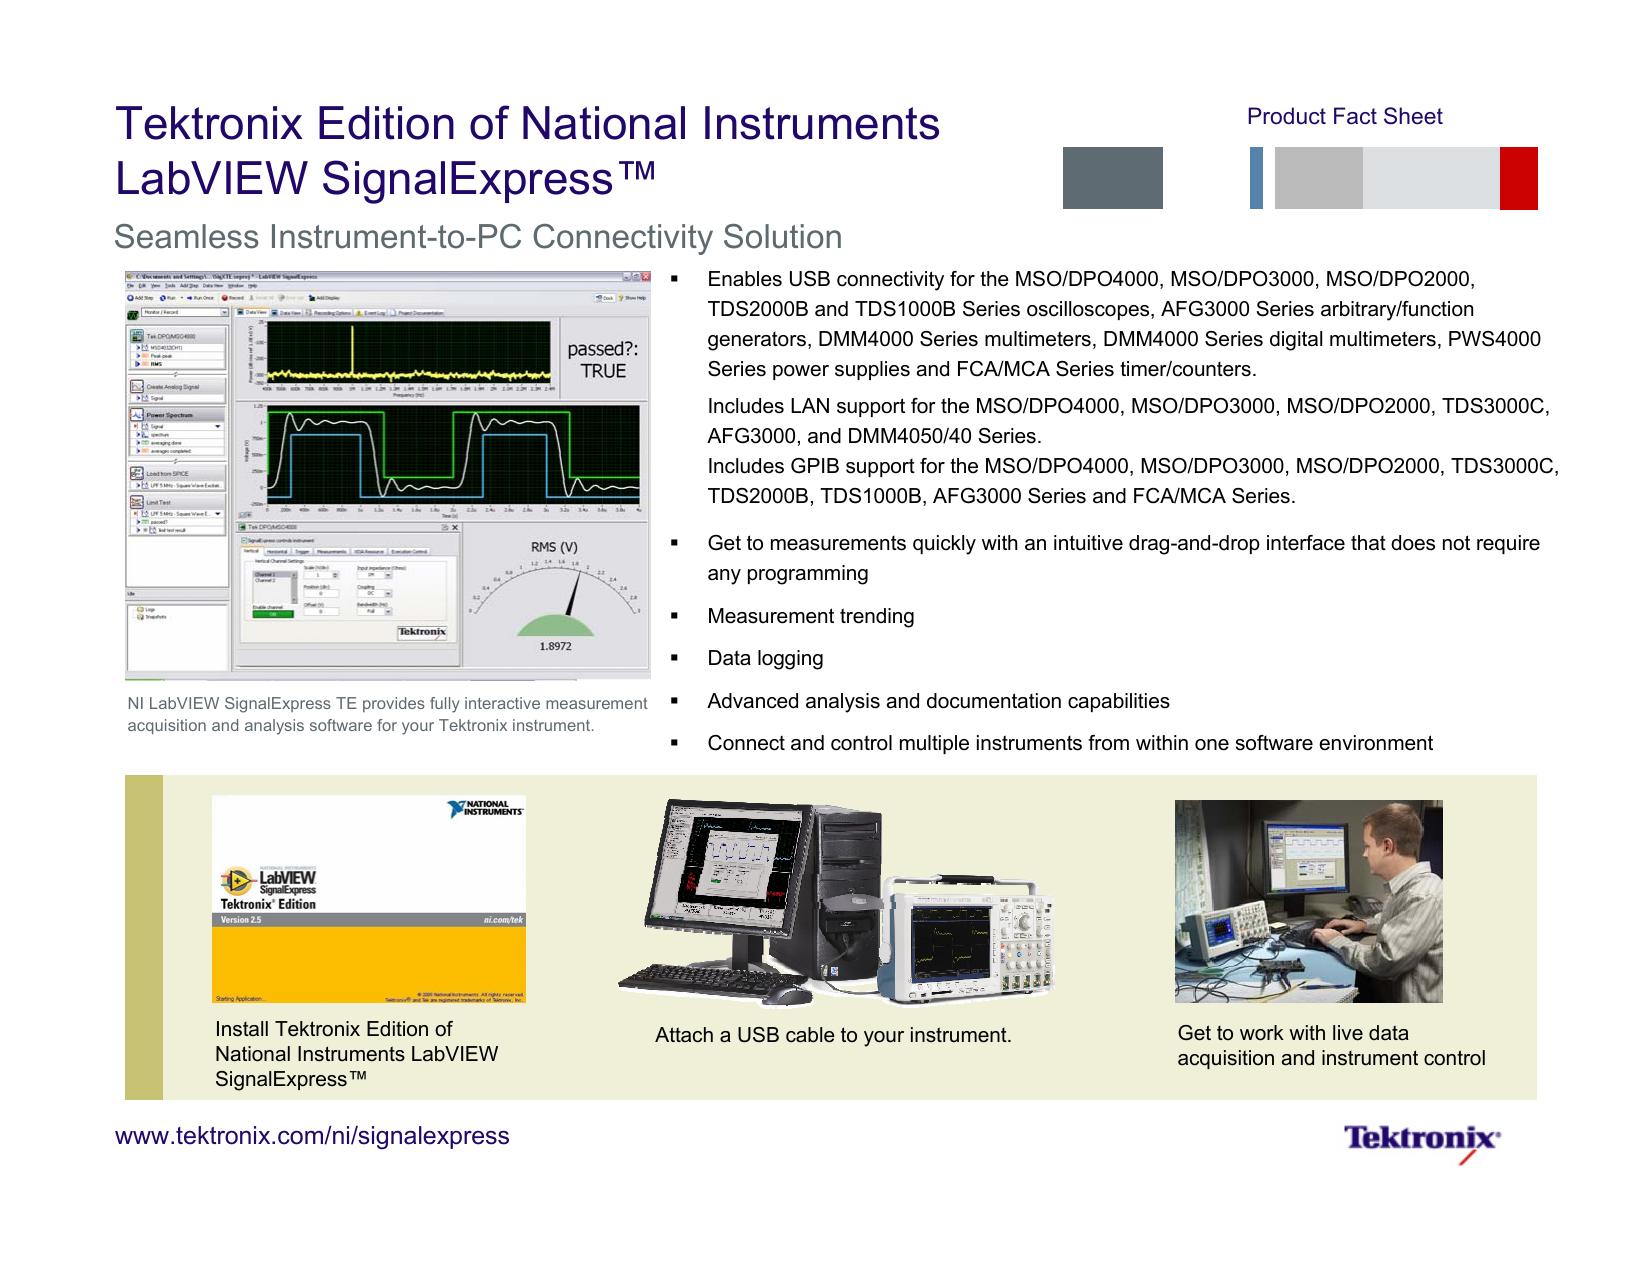 Dpo4032 oscilloscope dpo4032 | tektronix.